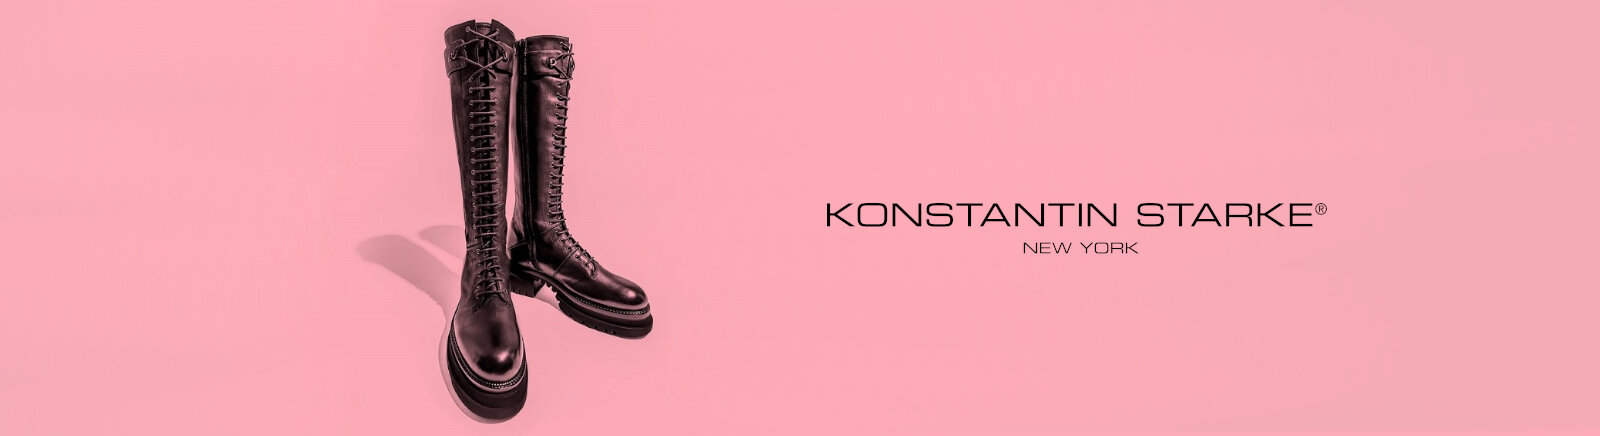 Gisy: Konstantin Starke Chelsea Boots für Damen online shoppen